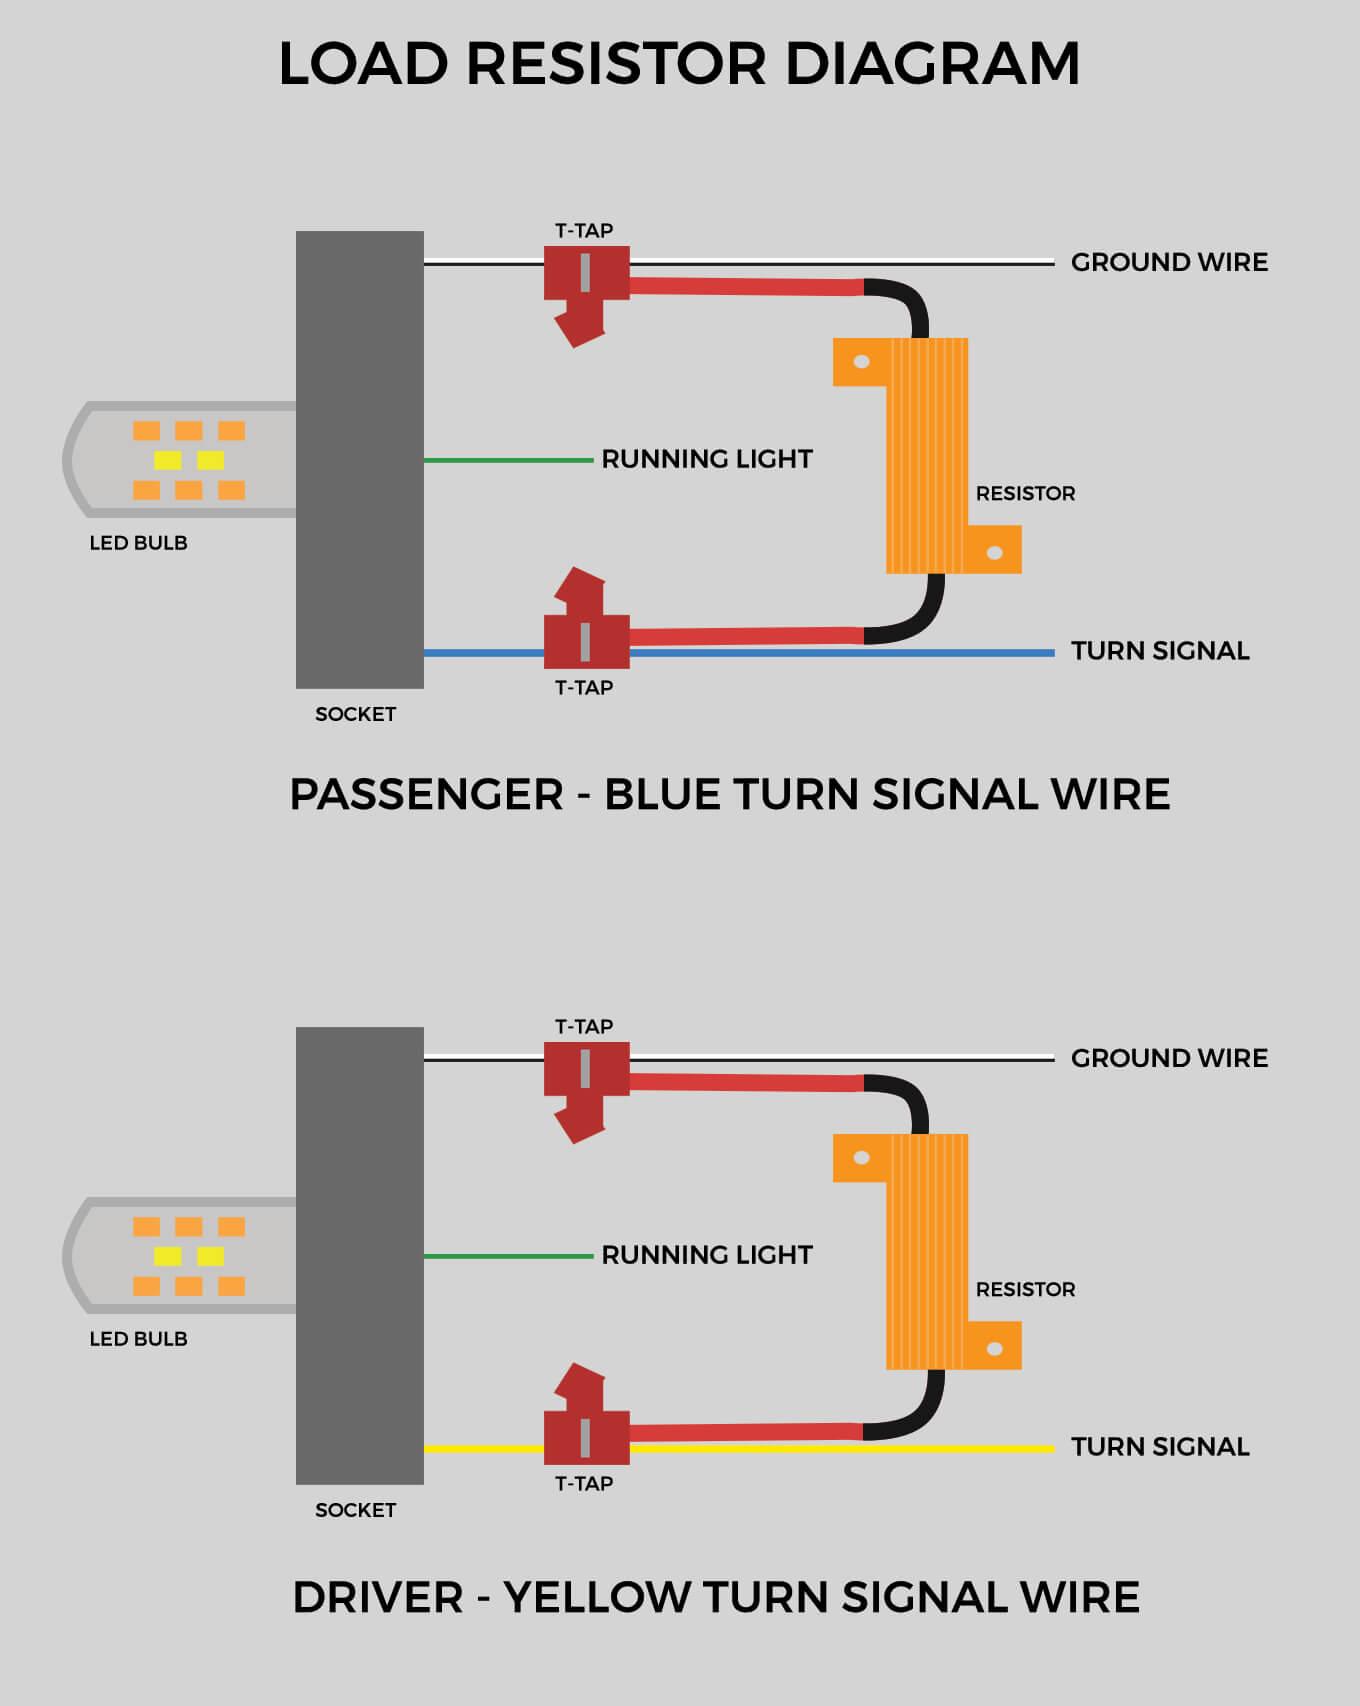 hight resolution of load resistors diagram for front turn signals on 5th gen 4runner